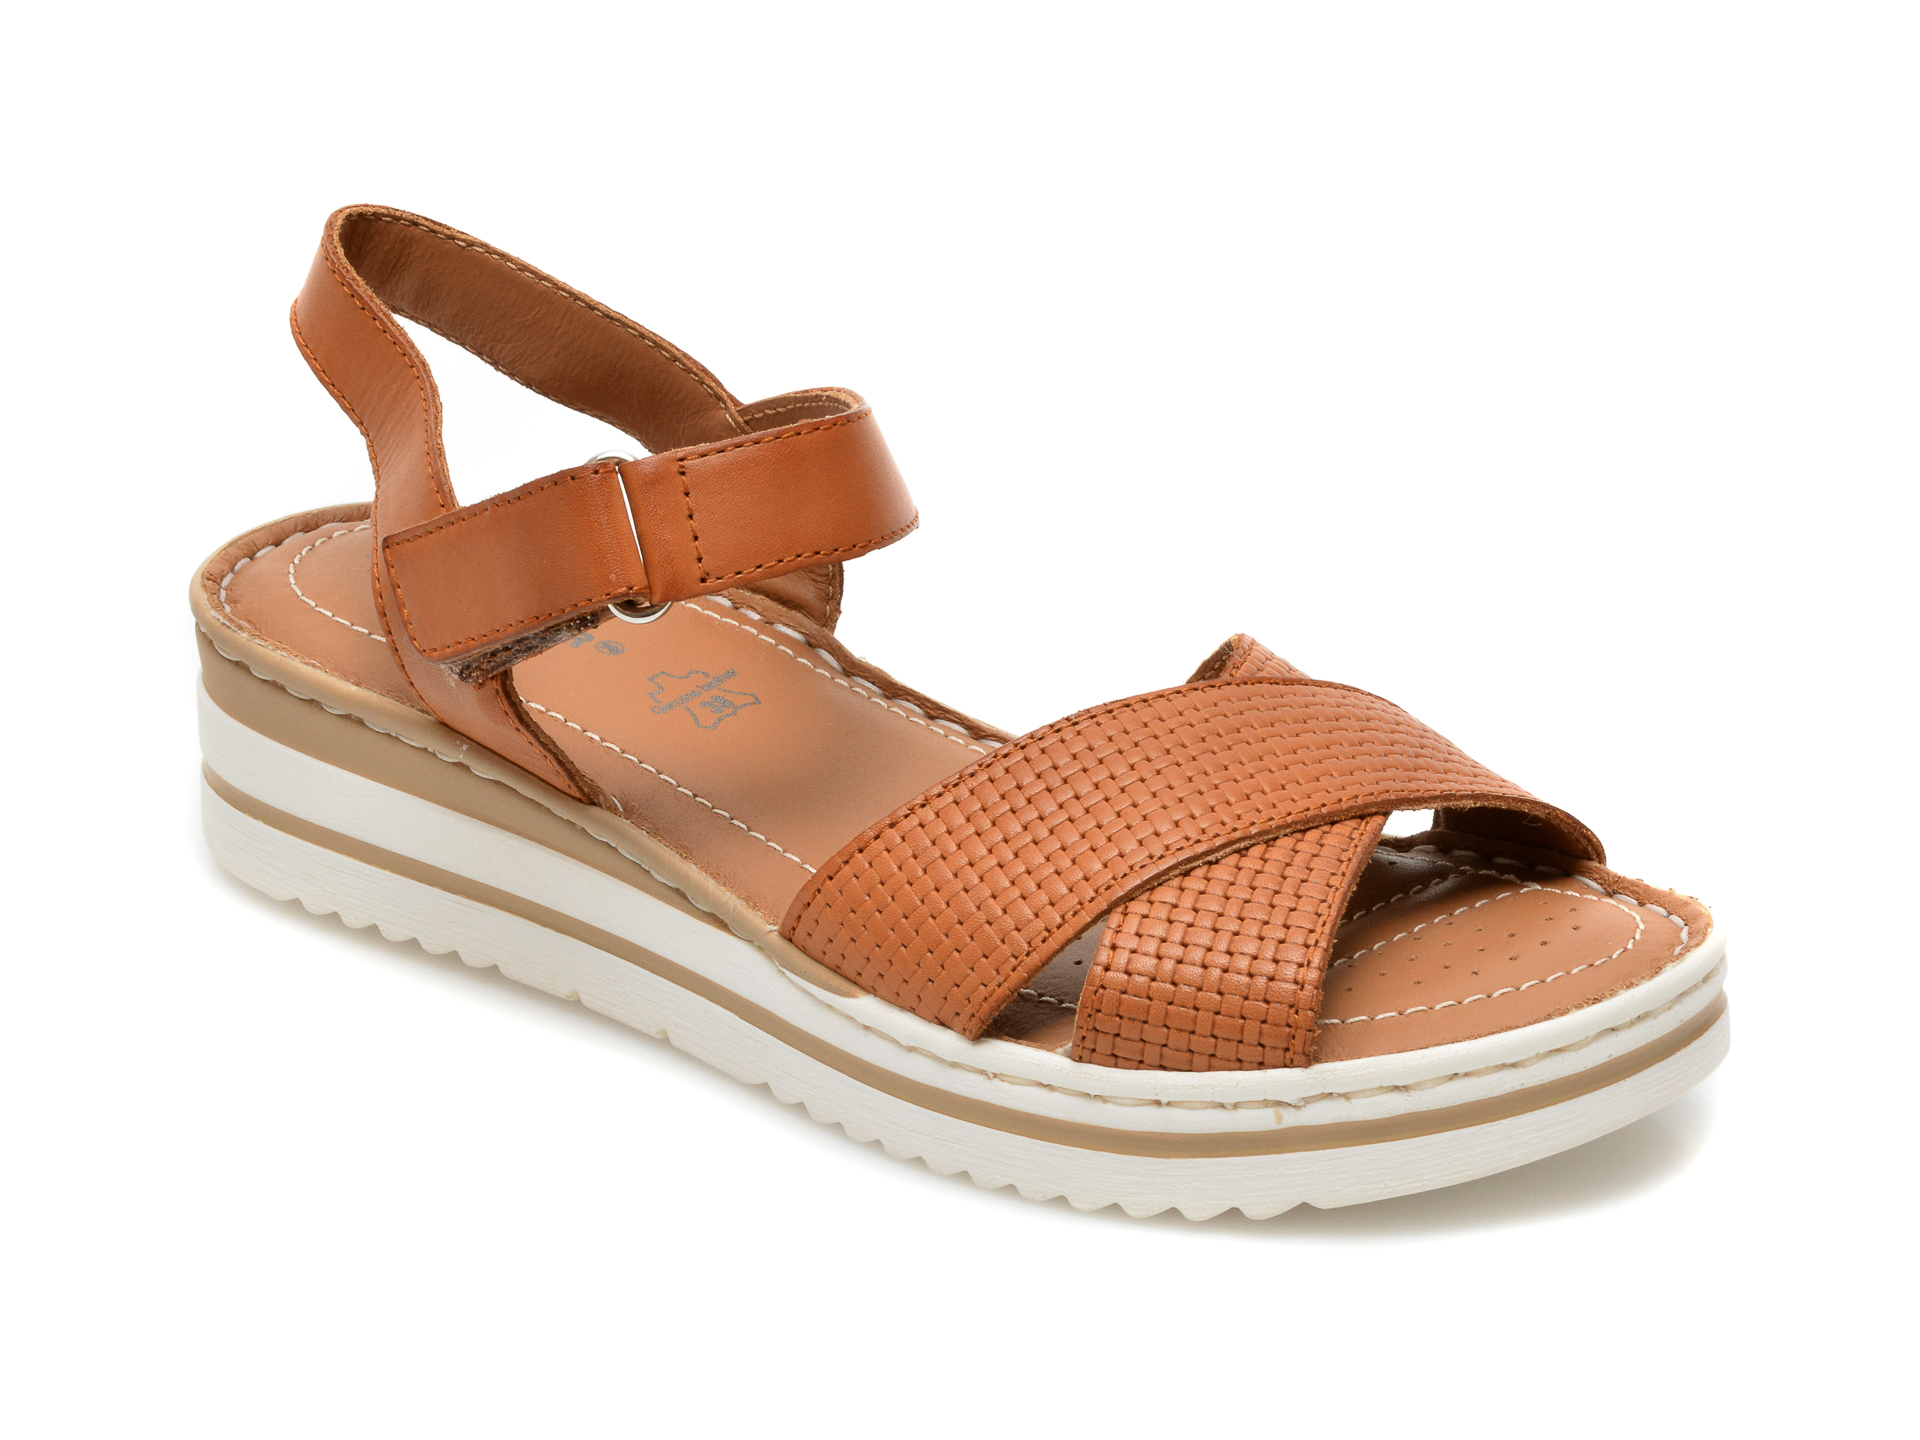 Sandale SALAMANDER maro, 34101, din piele naturala imagine otter.ro 2021